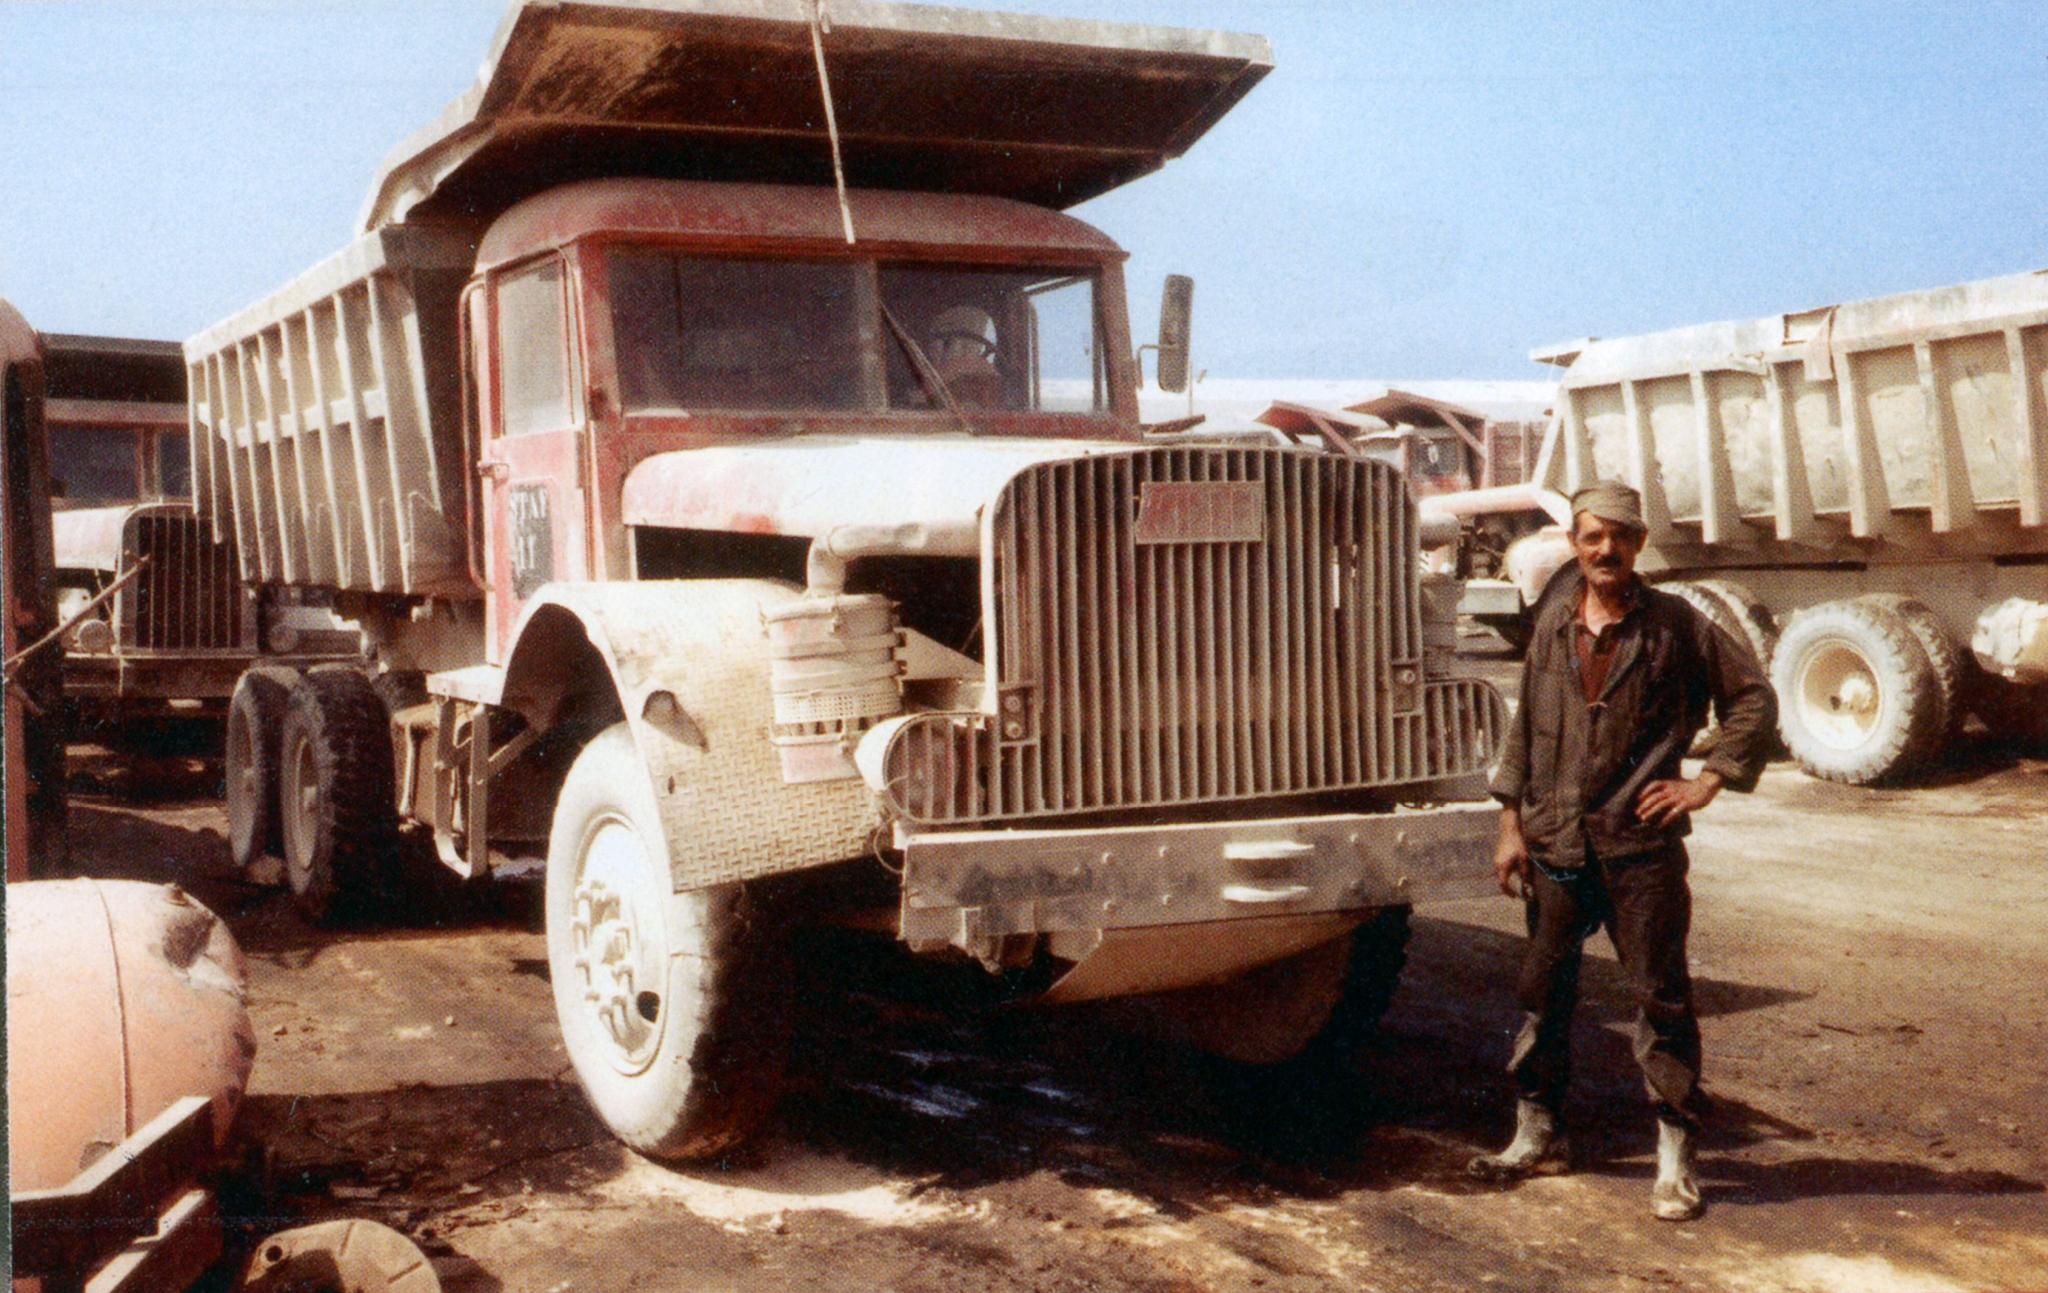 Transport Routier au Maroc - Histoire - Page 2 49882255537_5f9b79e280_o_d